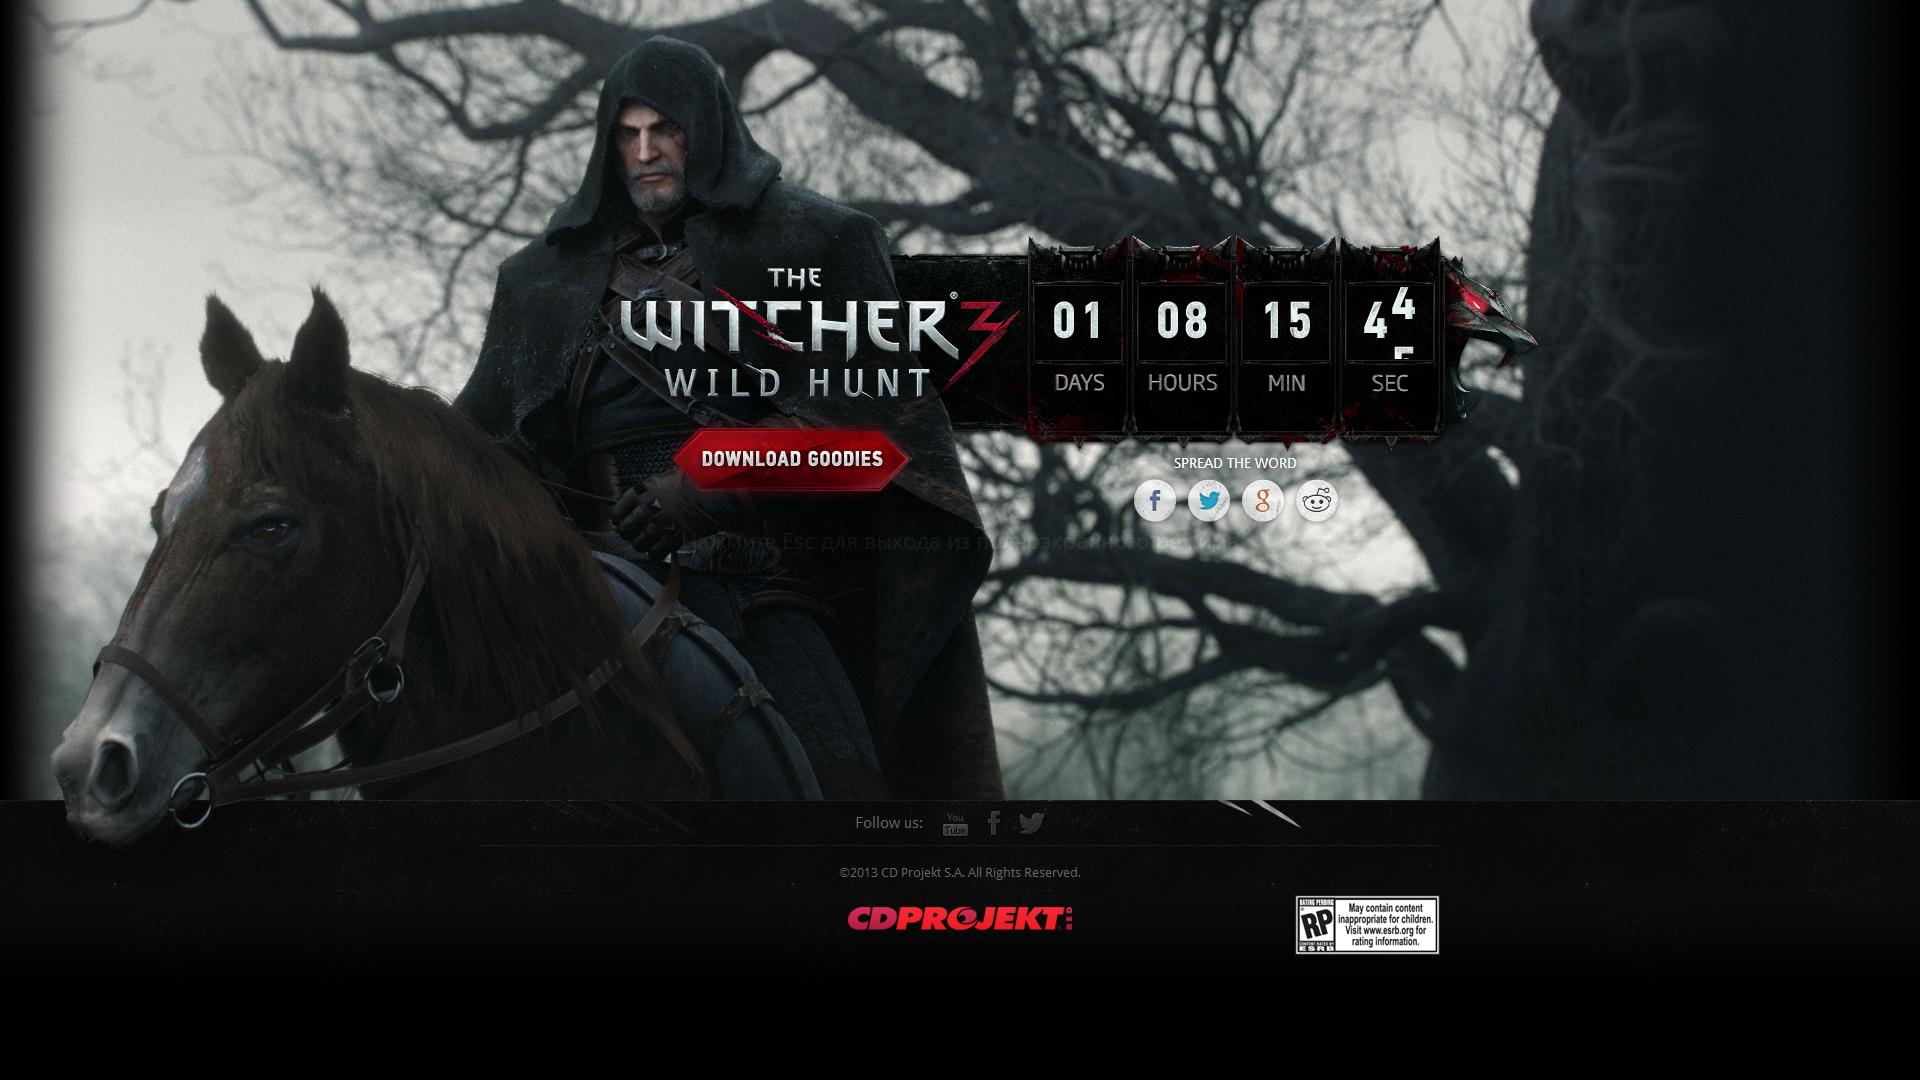 Запущен мистический таймер для The Witcher 3: Wild Hunt. - Изображение 1